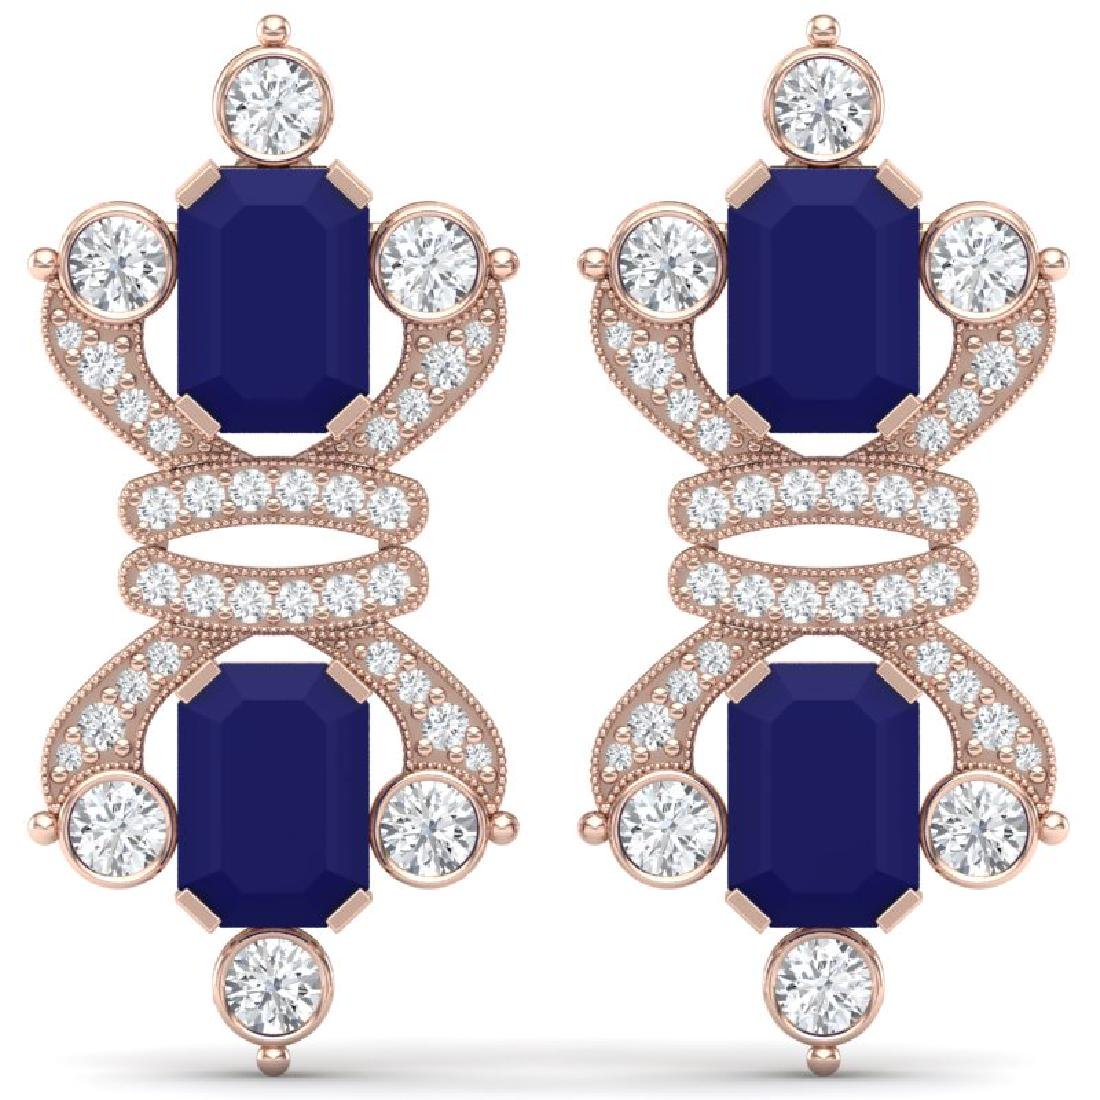 27.36 CTW Royalty Sapphire & VS Diamond Earrings 18K